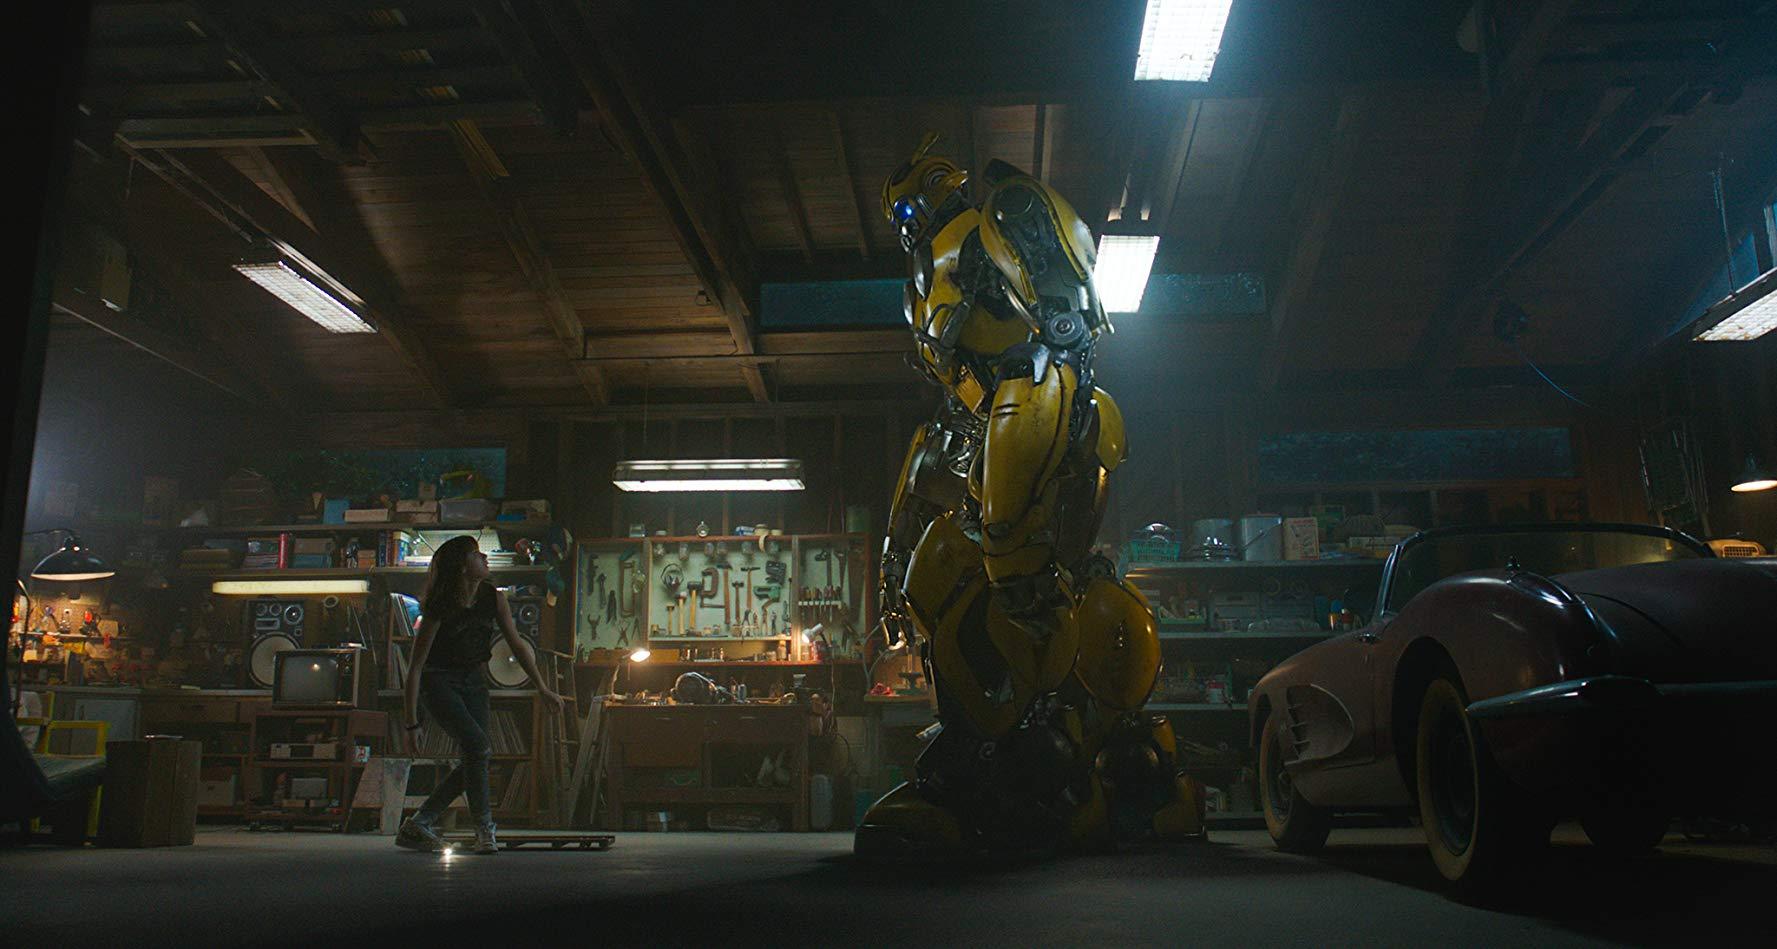 Bumblebee: Hailee Steinfeld e Bumblebee in una scena del film